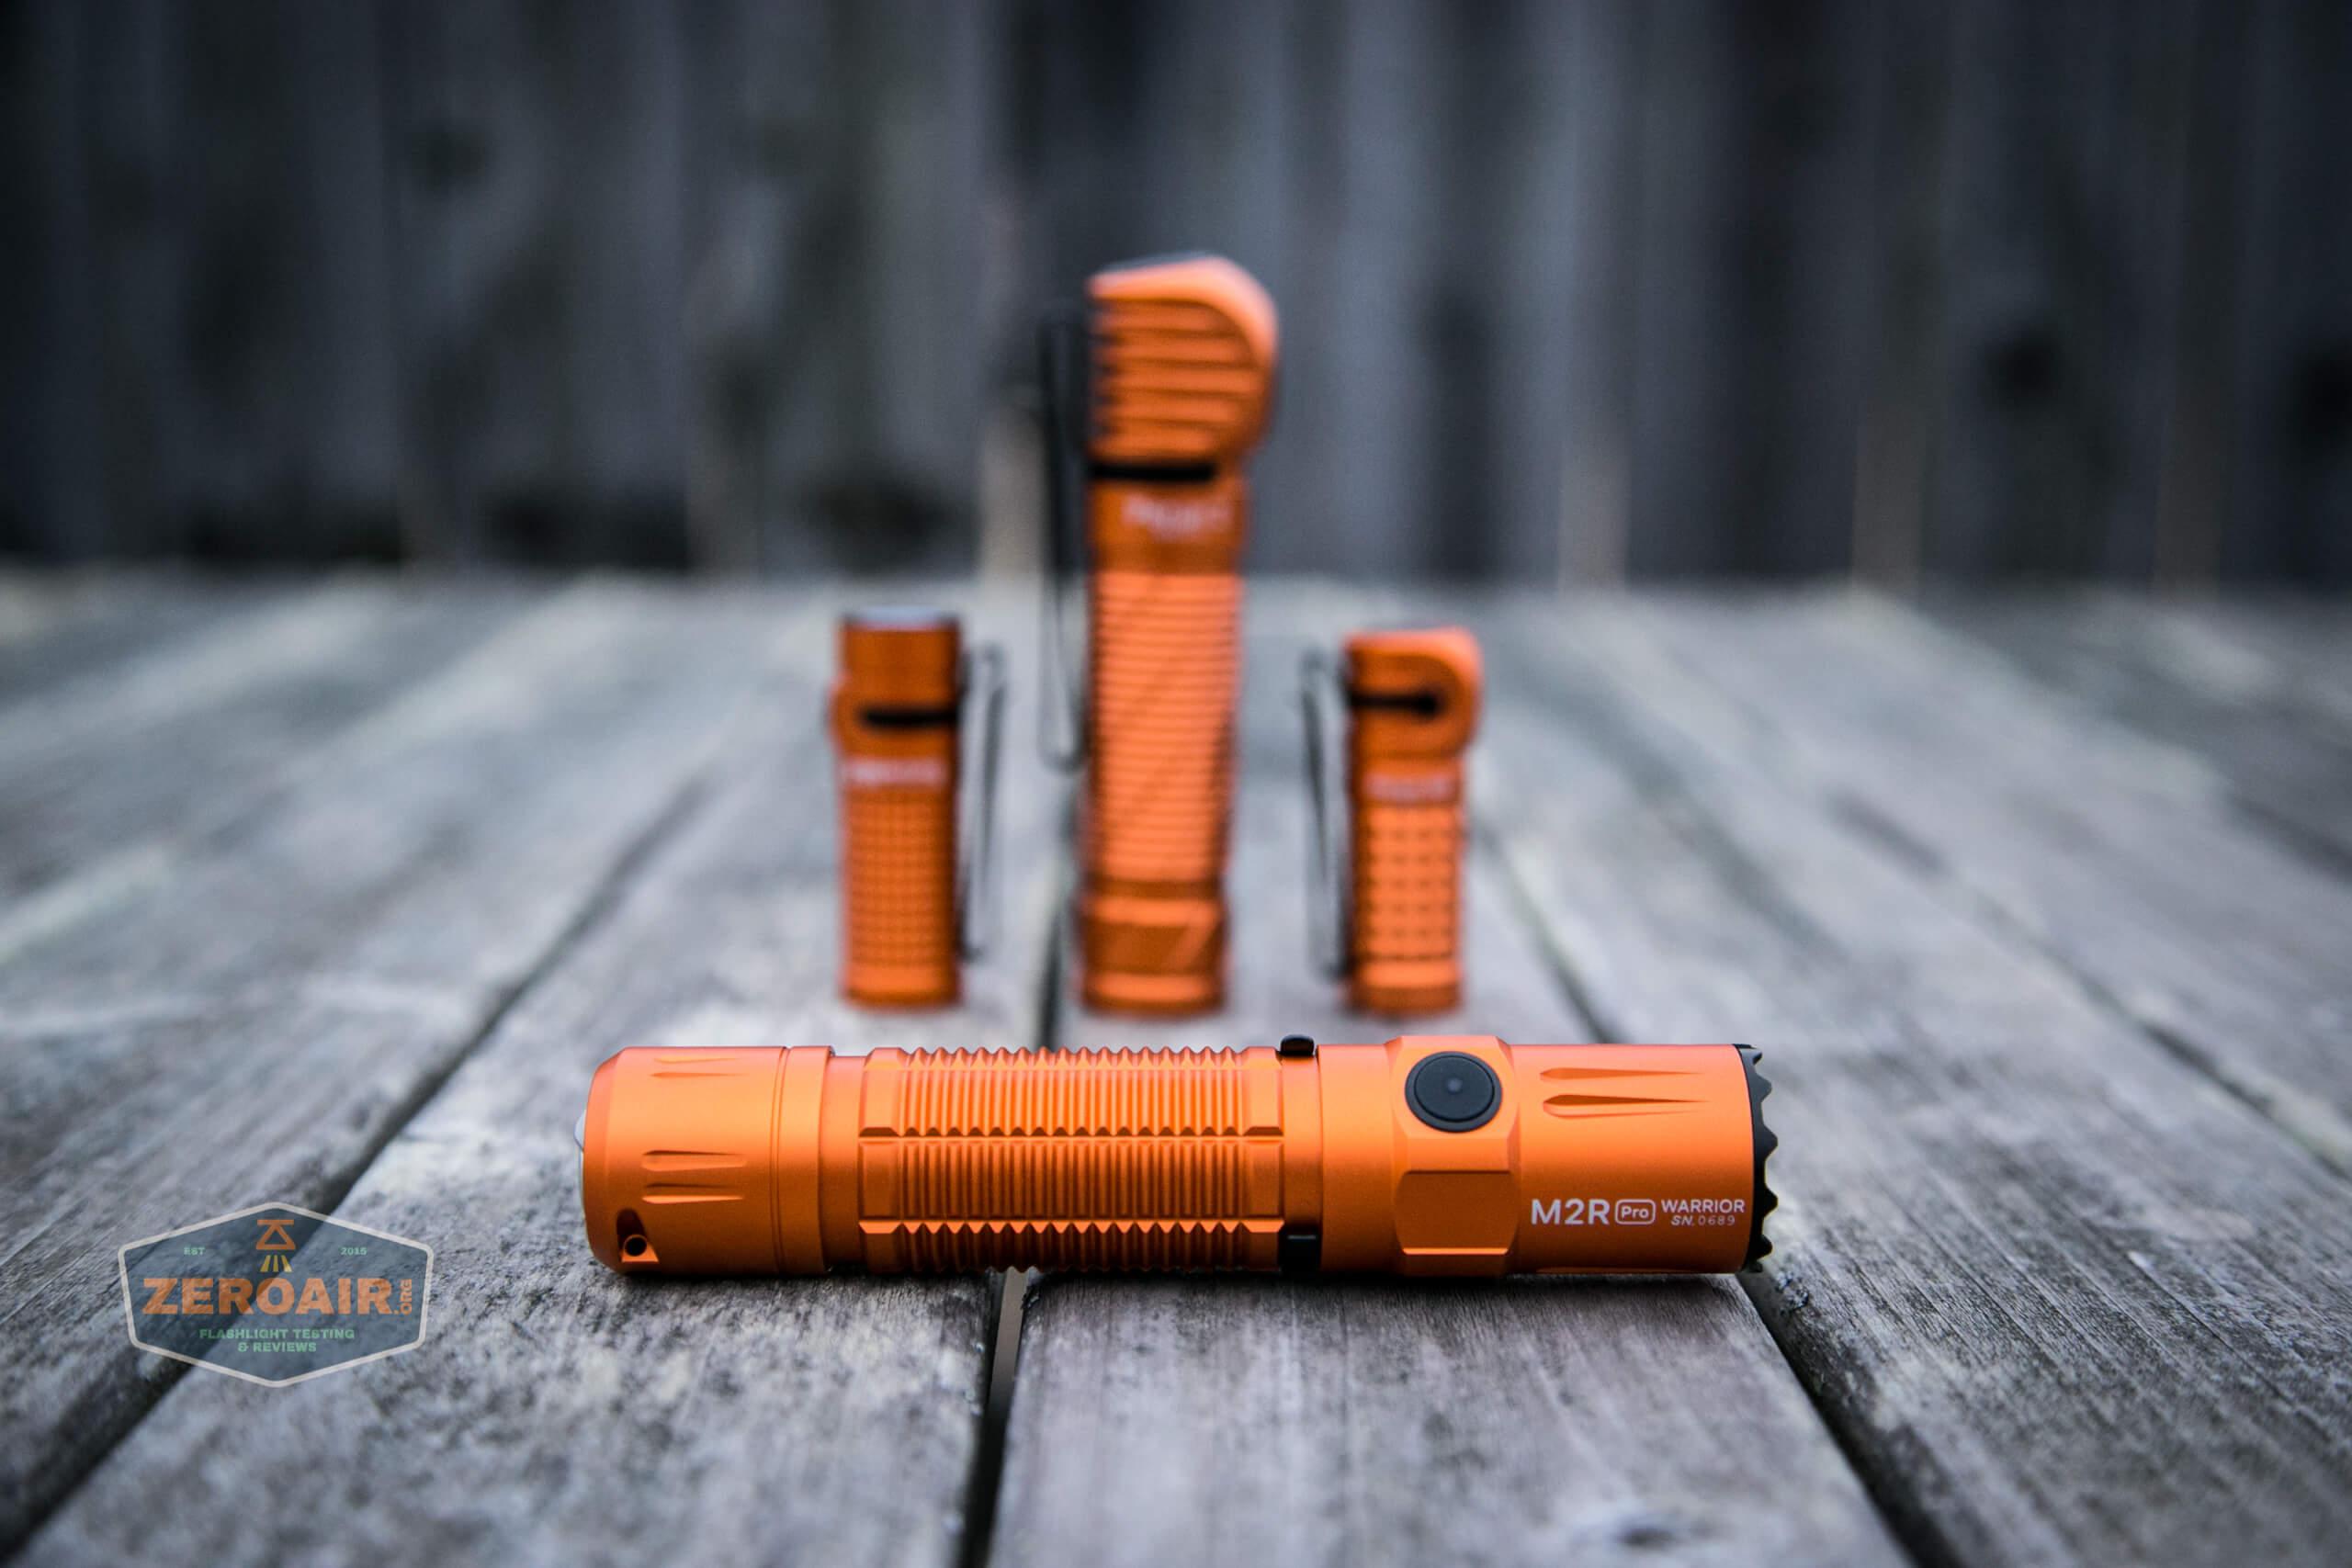 Olight M2R Pro Warrior Orange with other orange olights